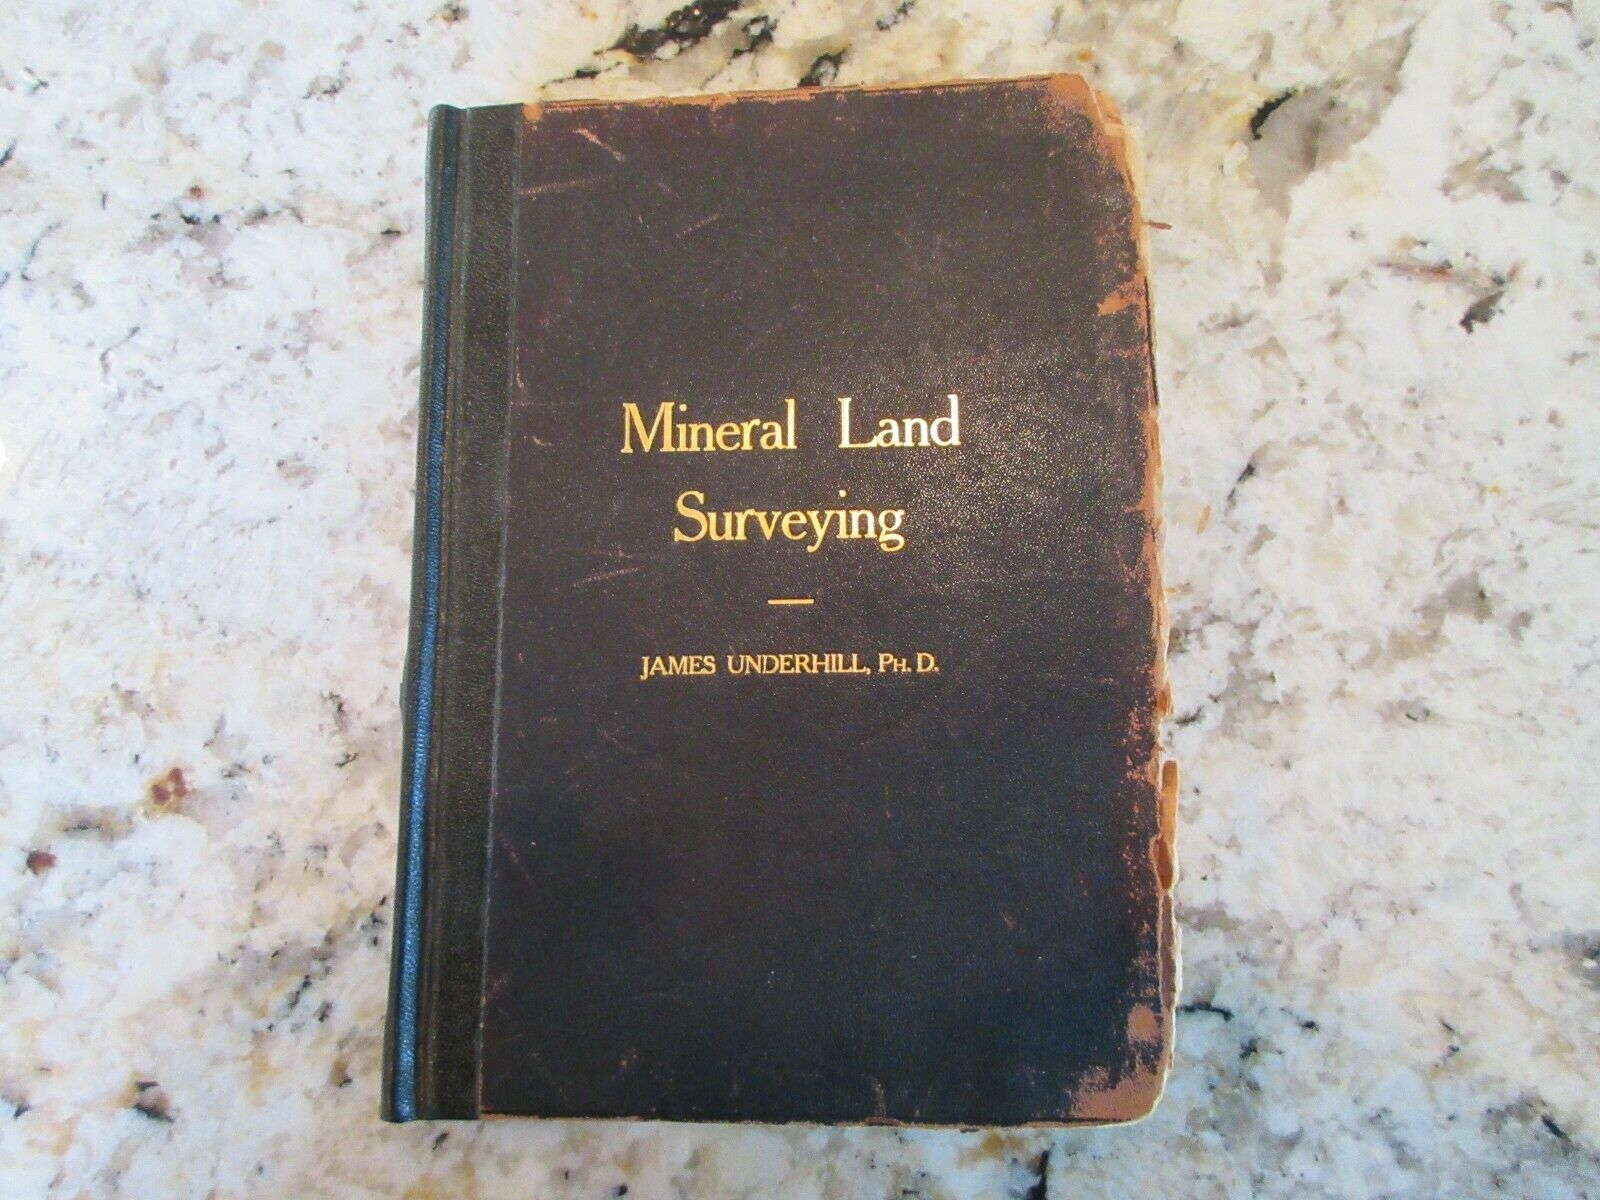 RARE Book Mineral Land Surveying   James Underhill PHD  1906